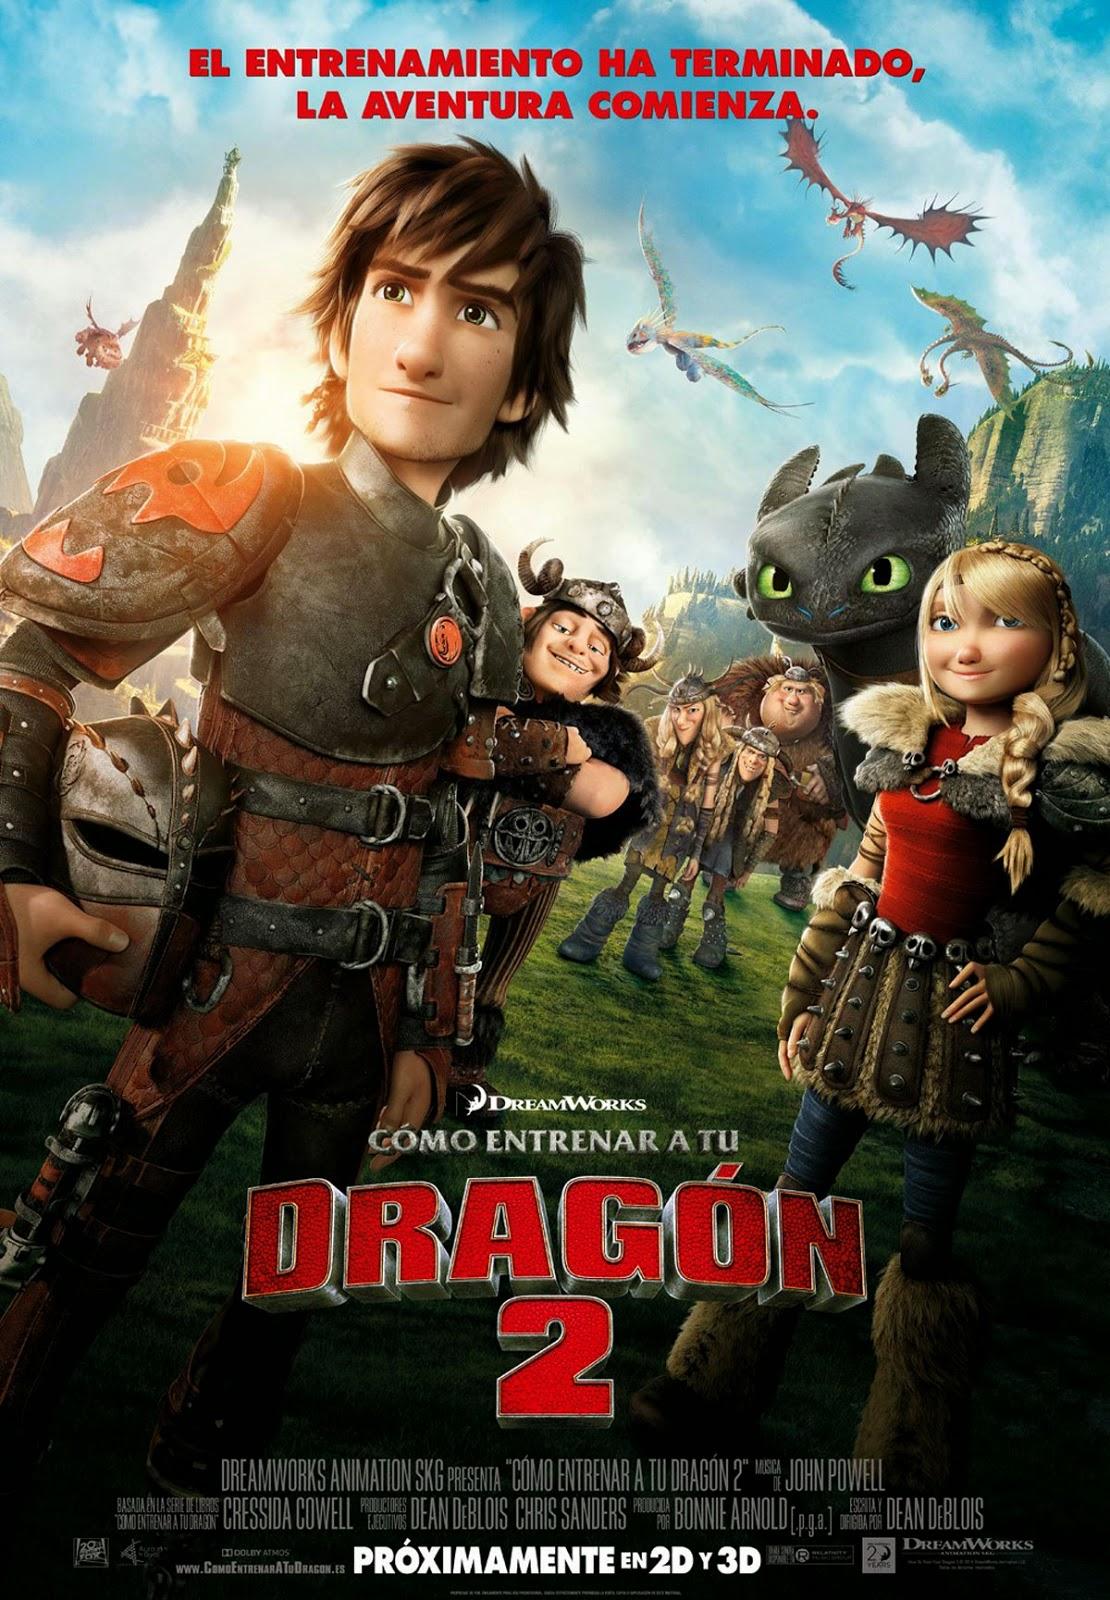 Películas-Fox-nominadas-Globos-Oro-2015-como-entrenar-a-tu-dragón-2